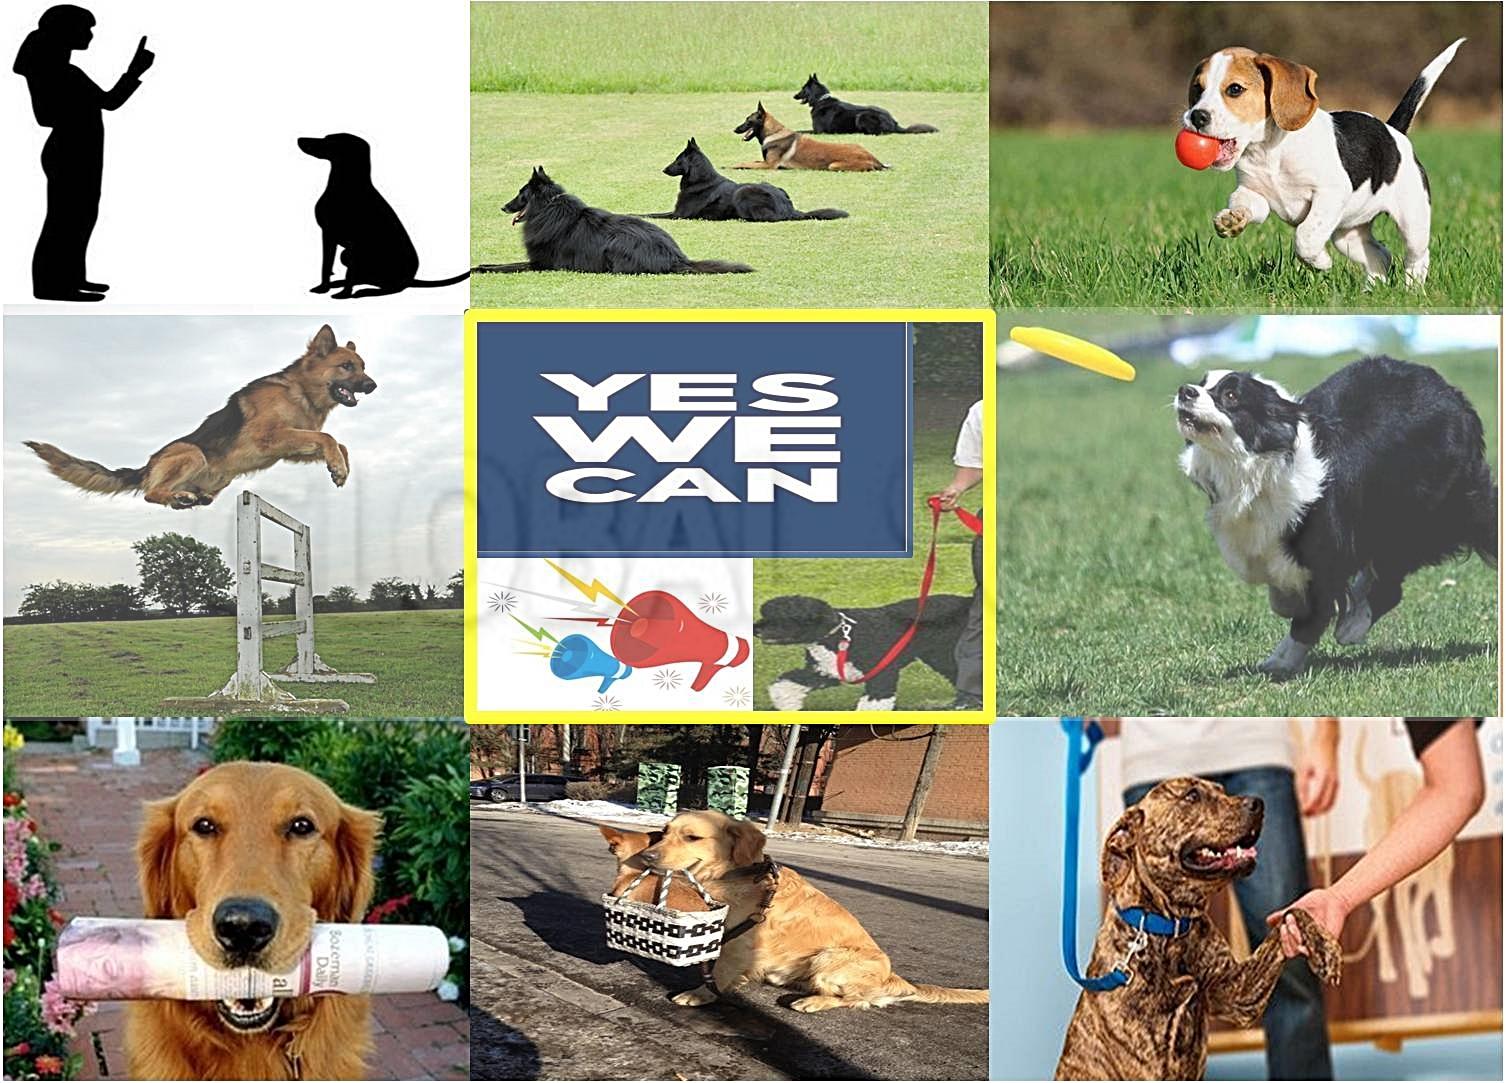 dog-ad2-2.jpg